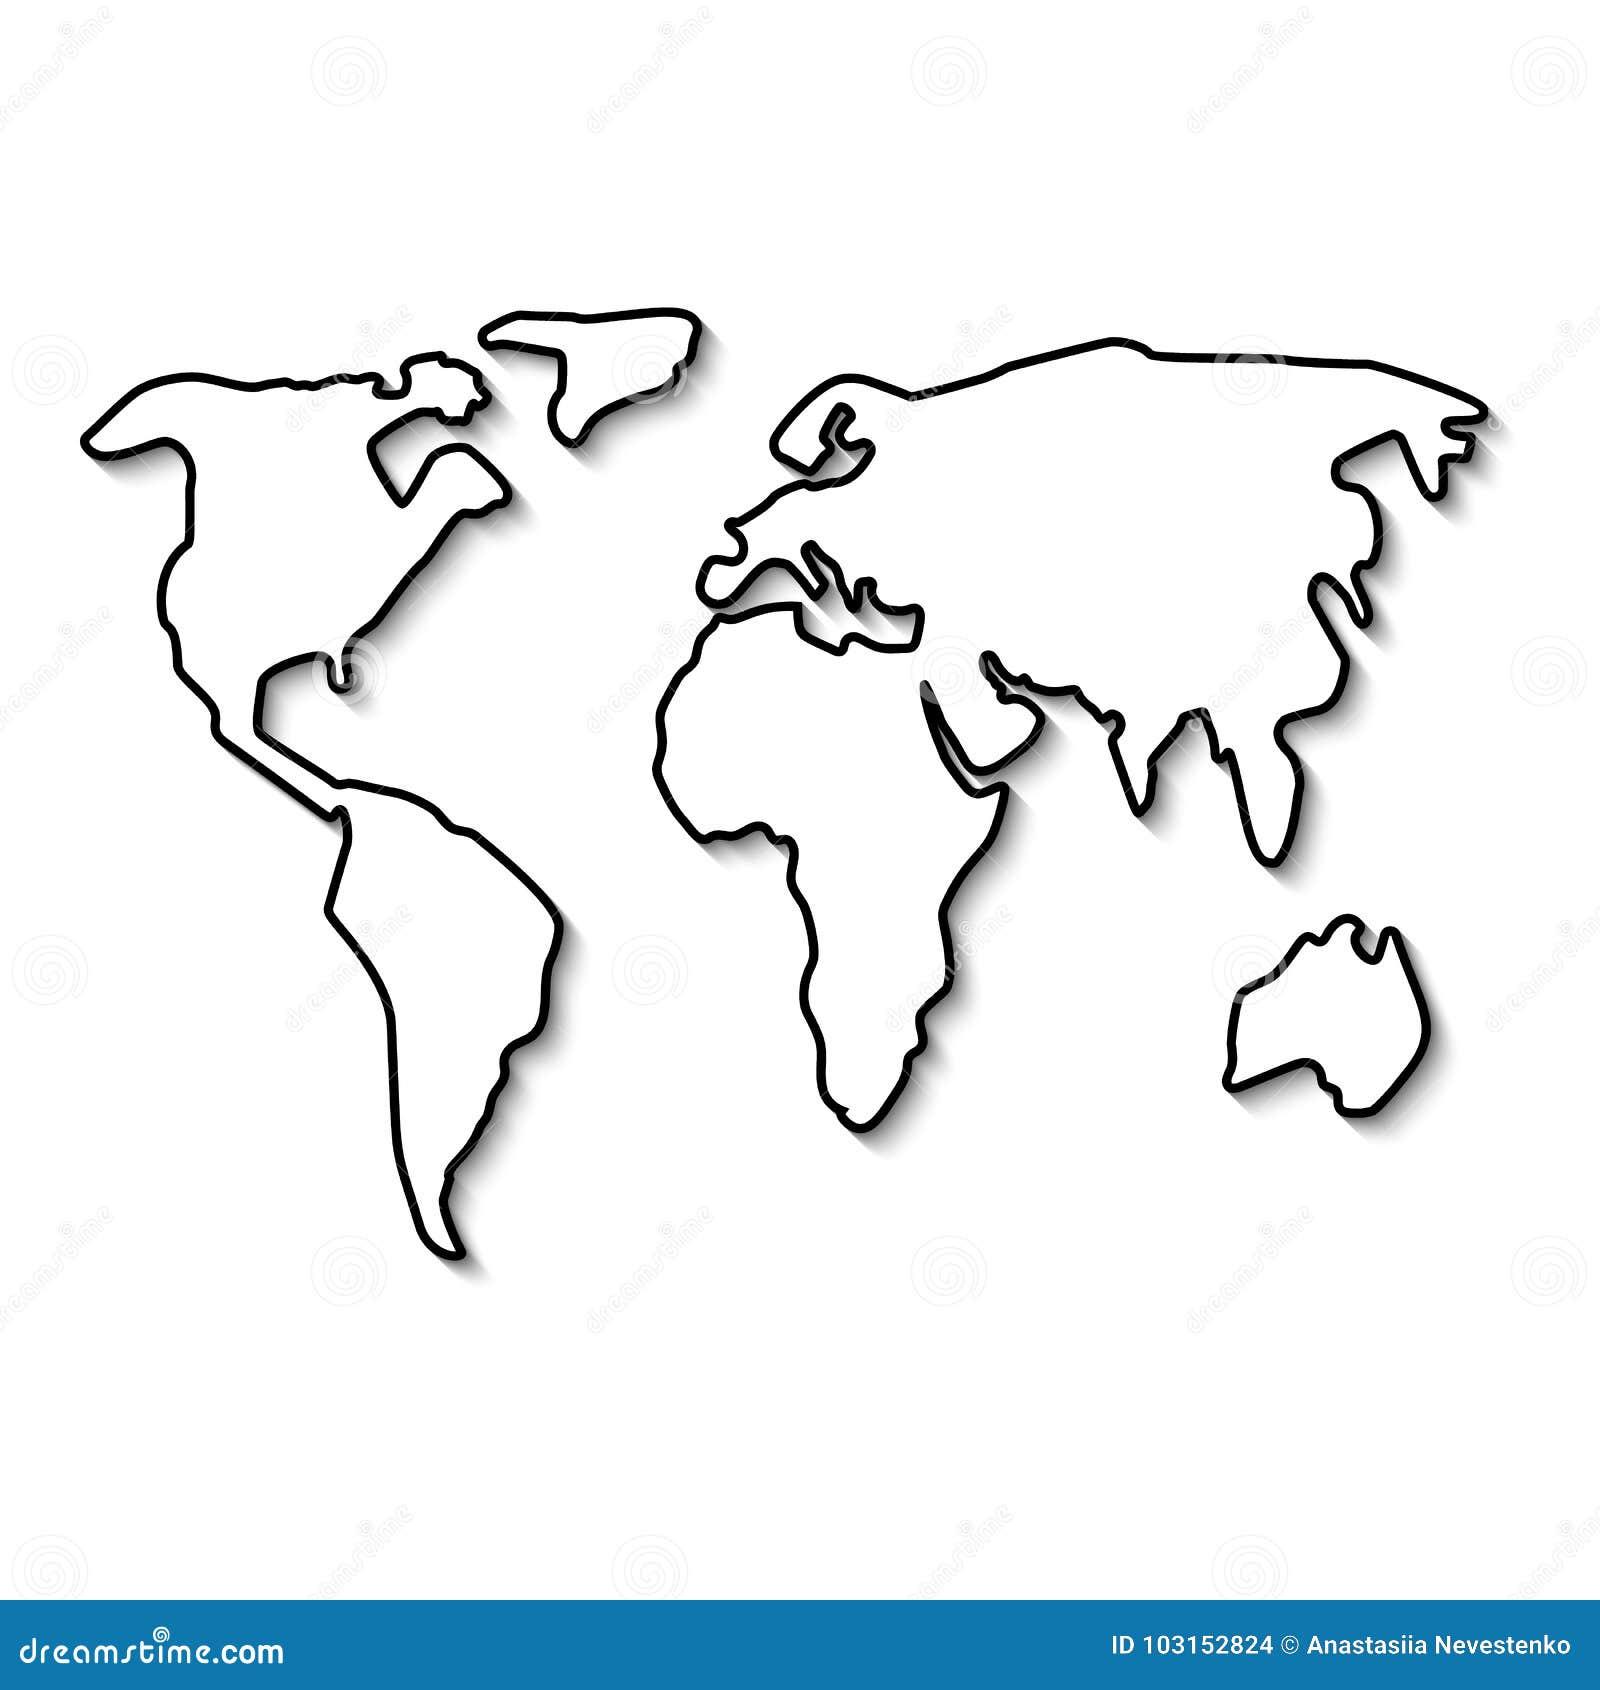 World map black line stock vector. Illustration of earth ...